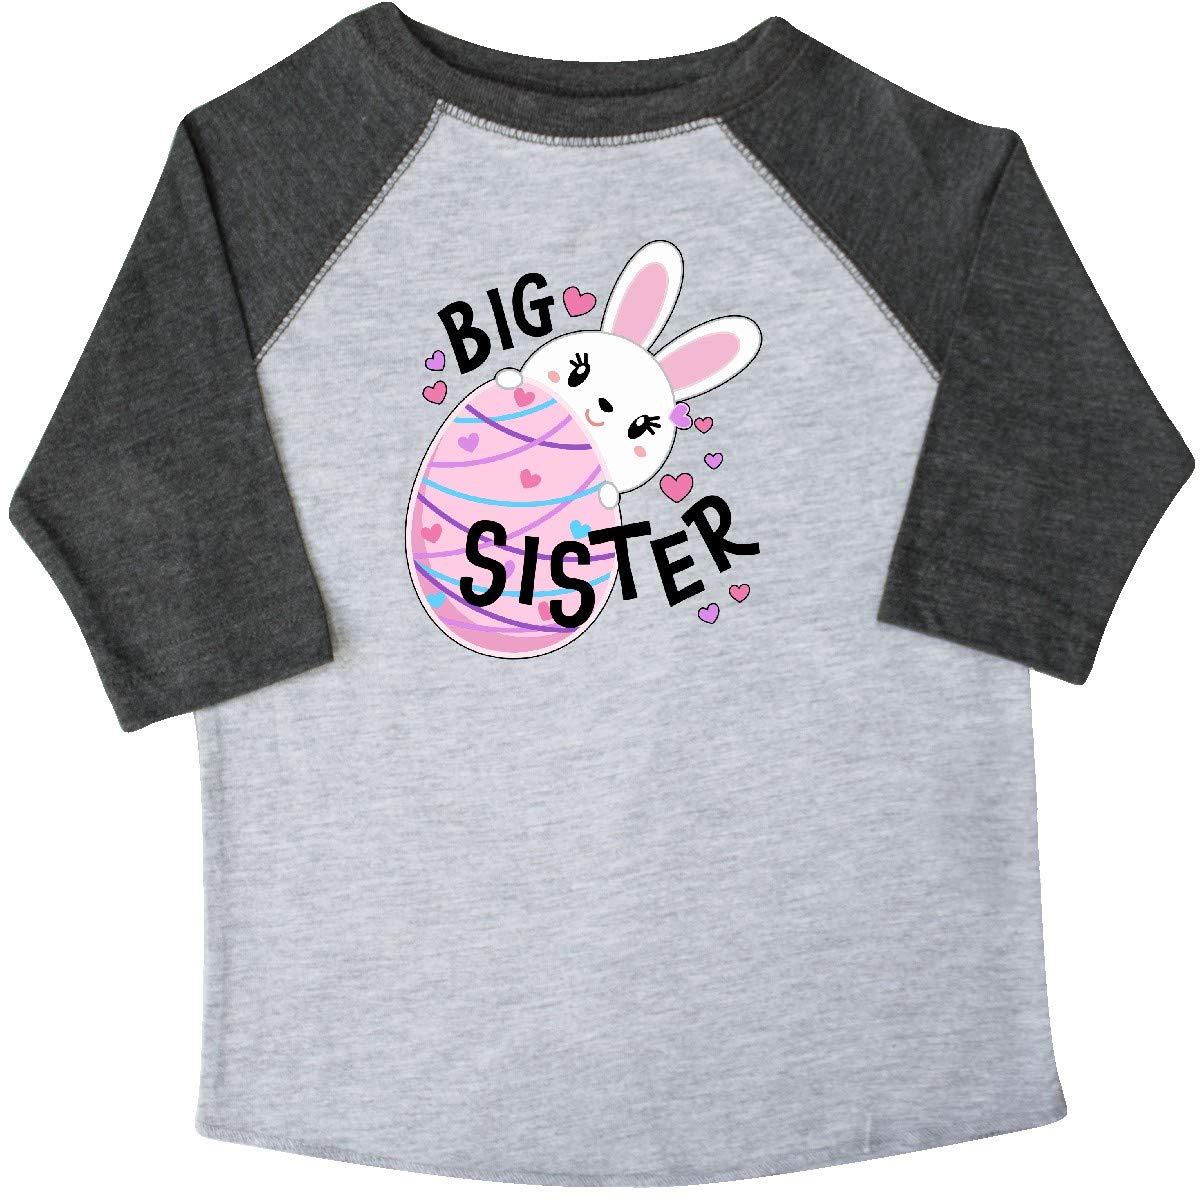 Easter Egg Toddler T-Shirt inktastic Big Sister Bunny